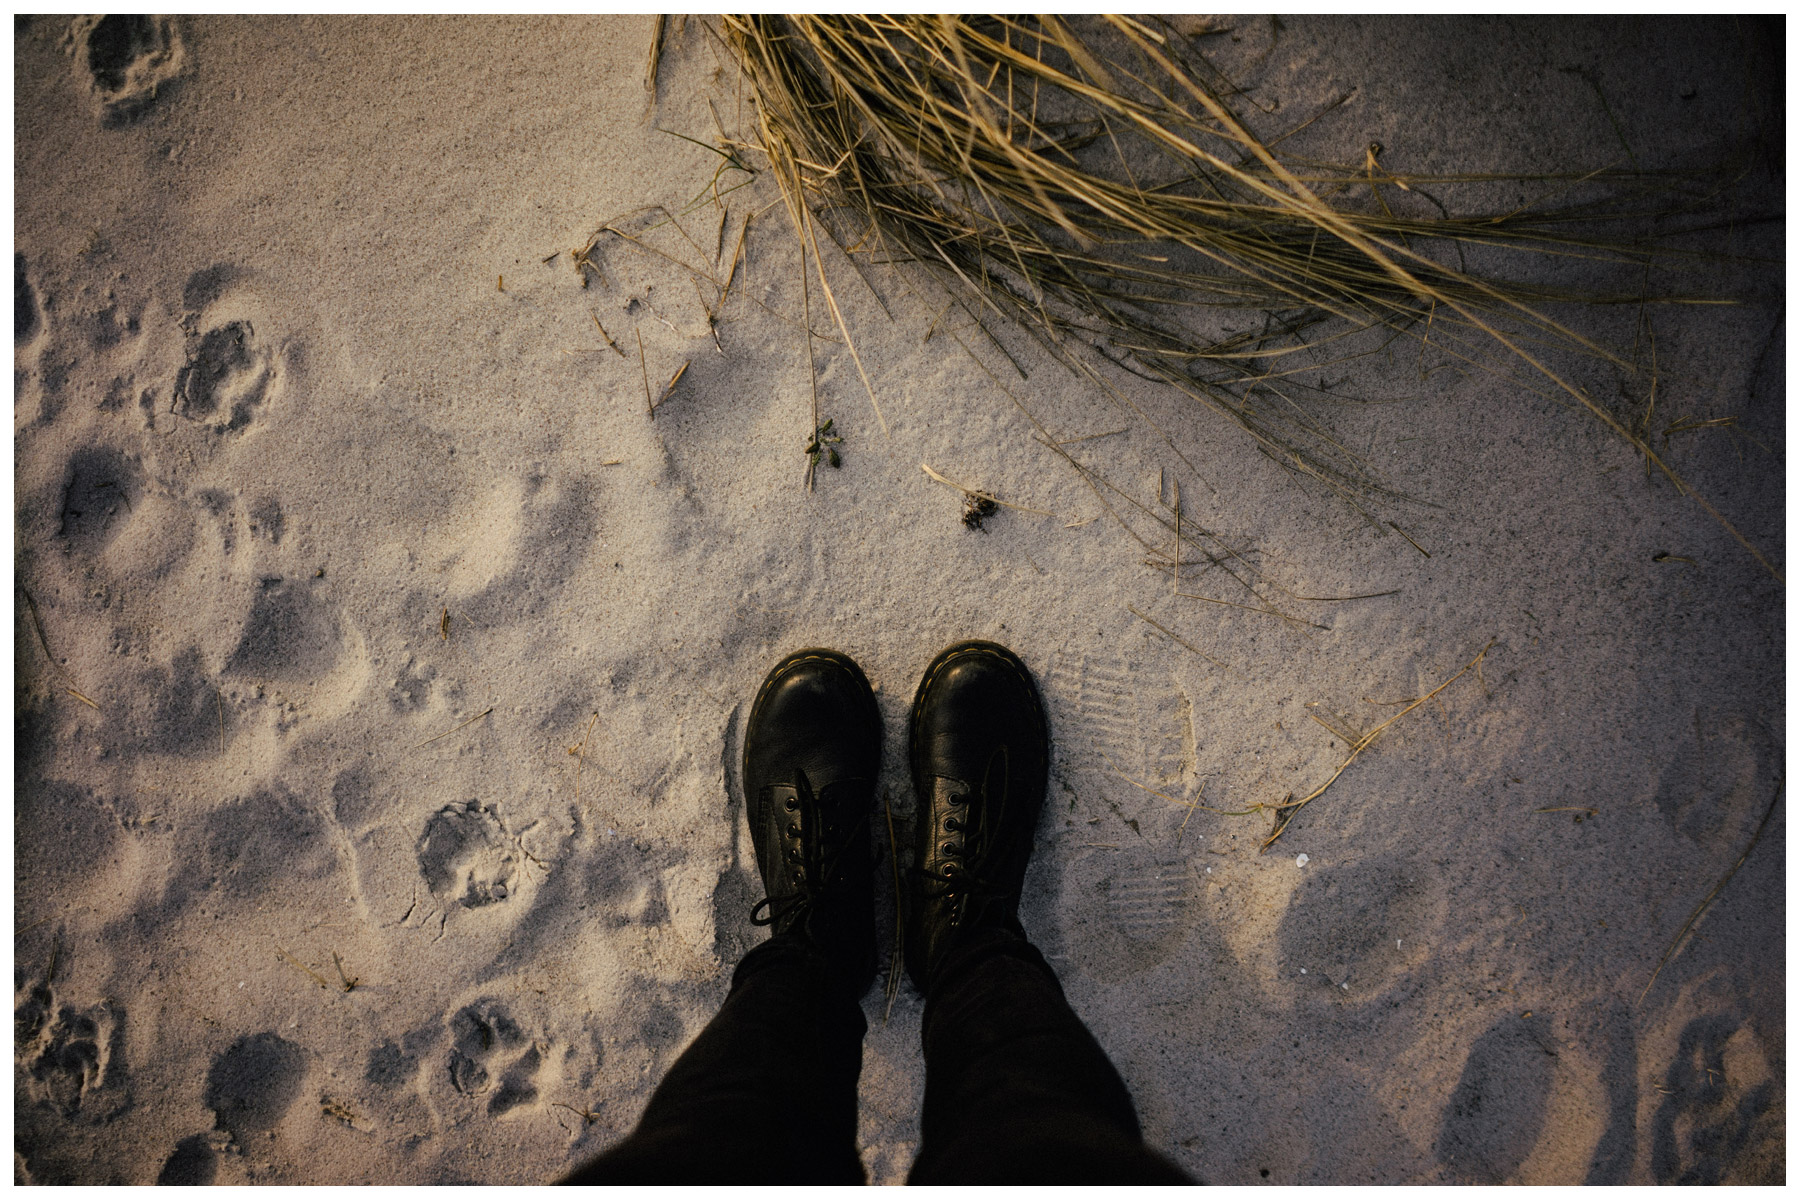 reise-blog-ostsee-warnemünde-travel-ohhedwig-6